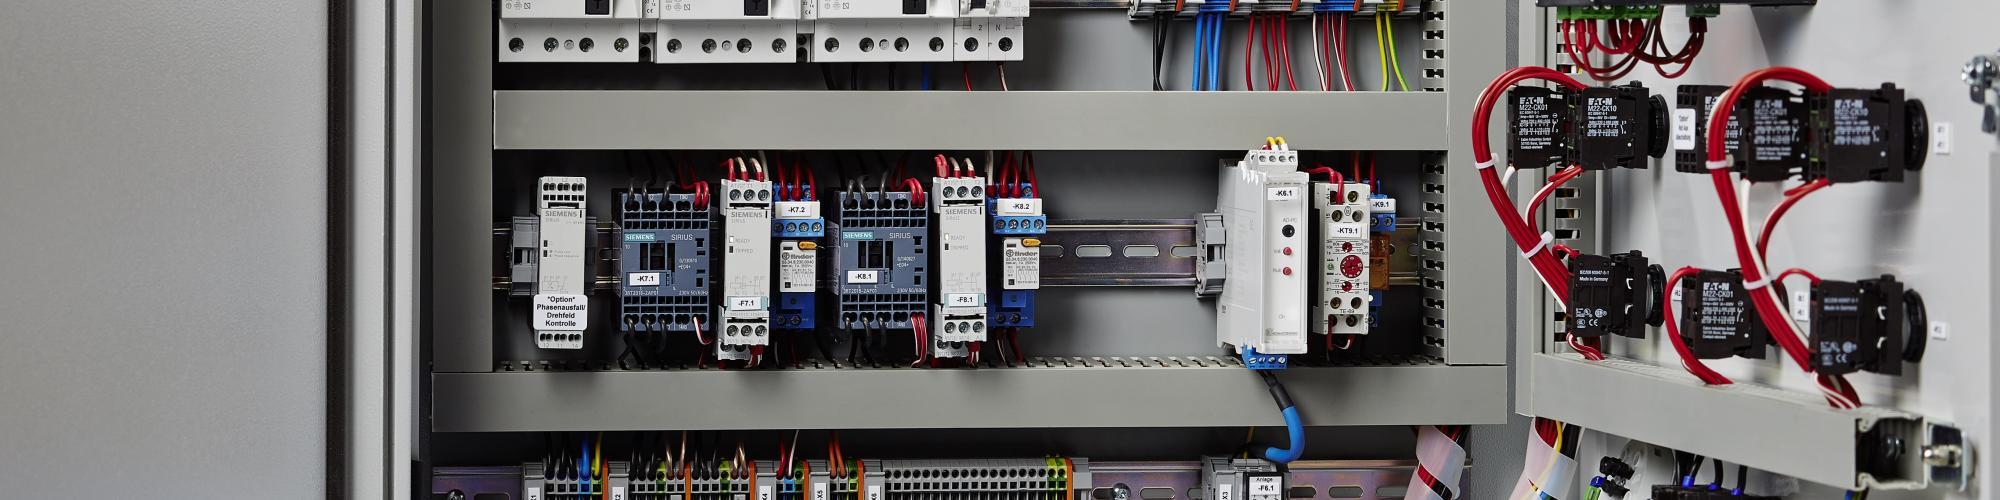 Elektro Ertl GmbH & Co. KG